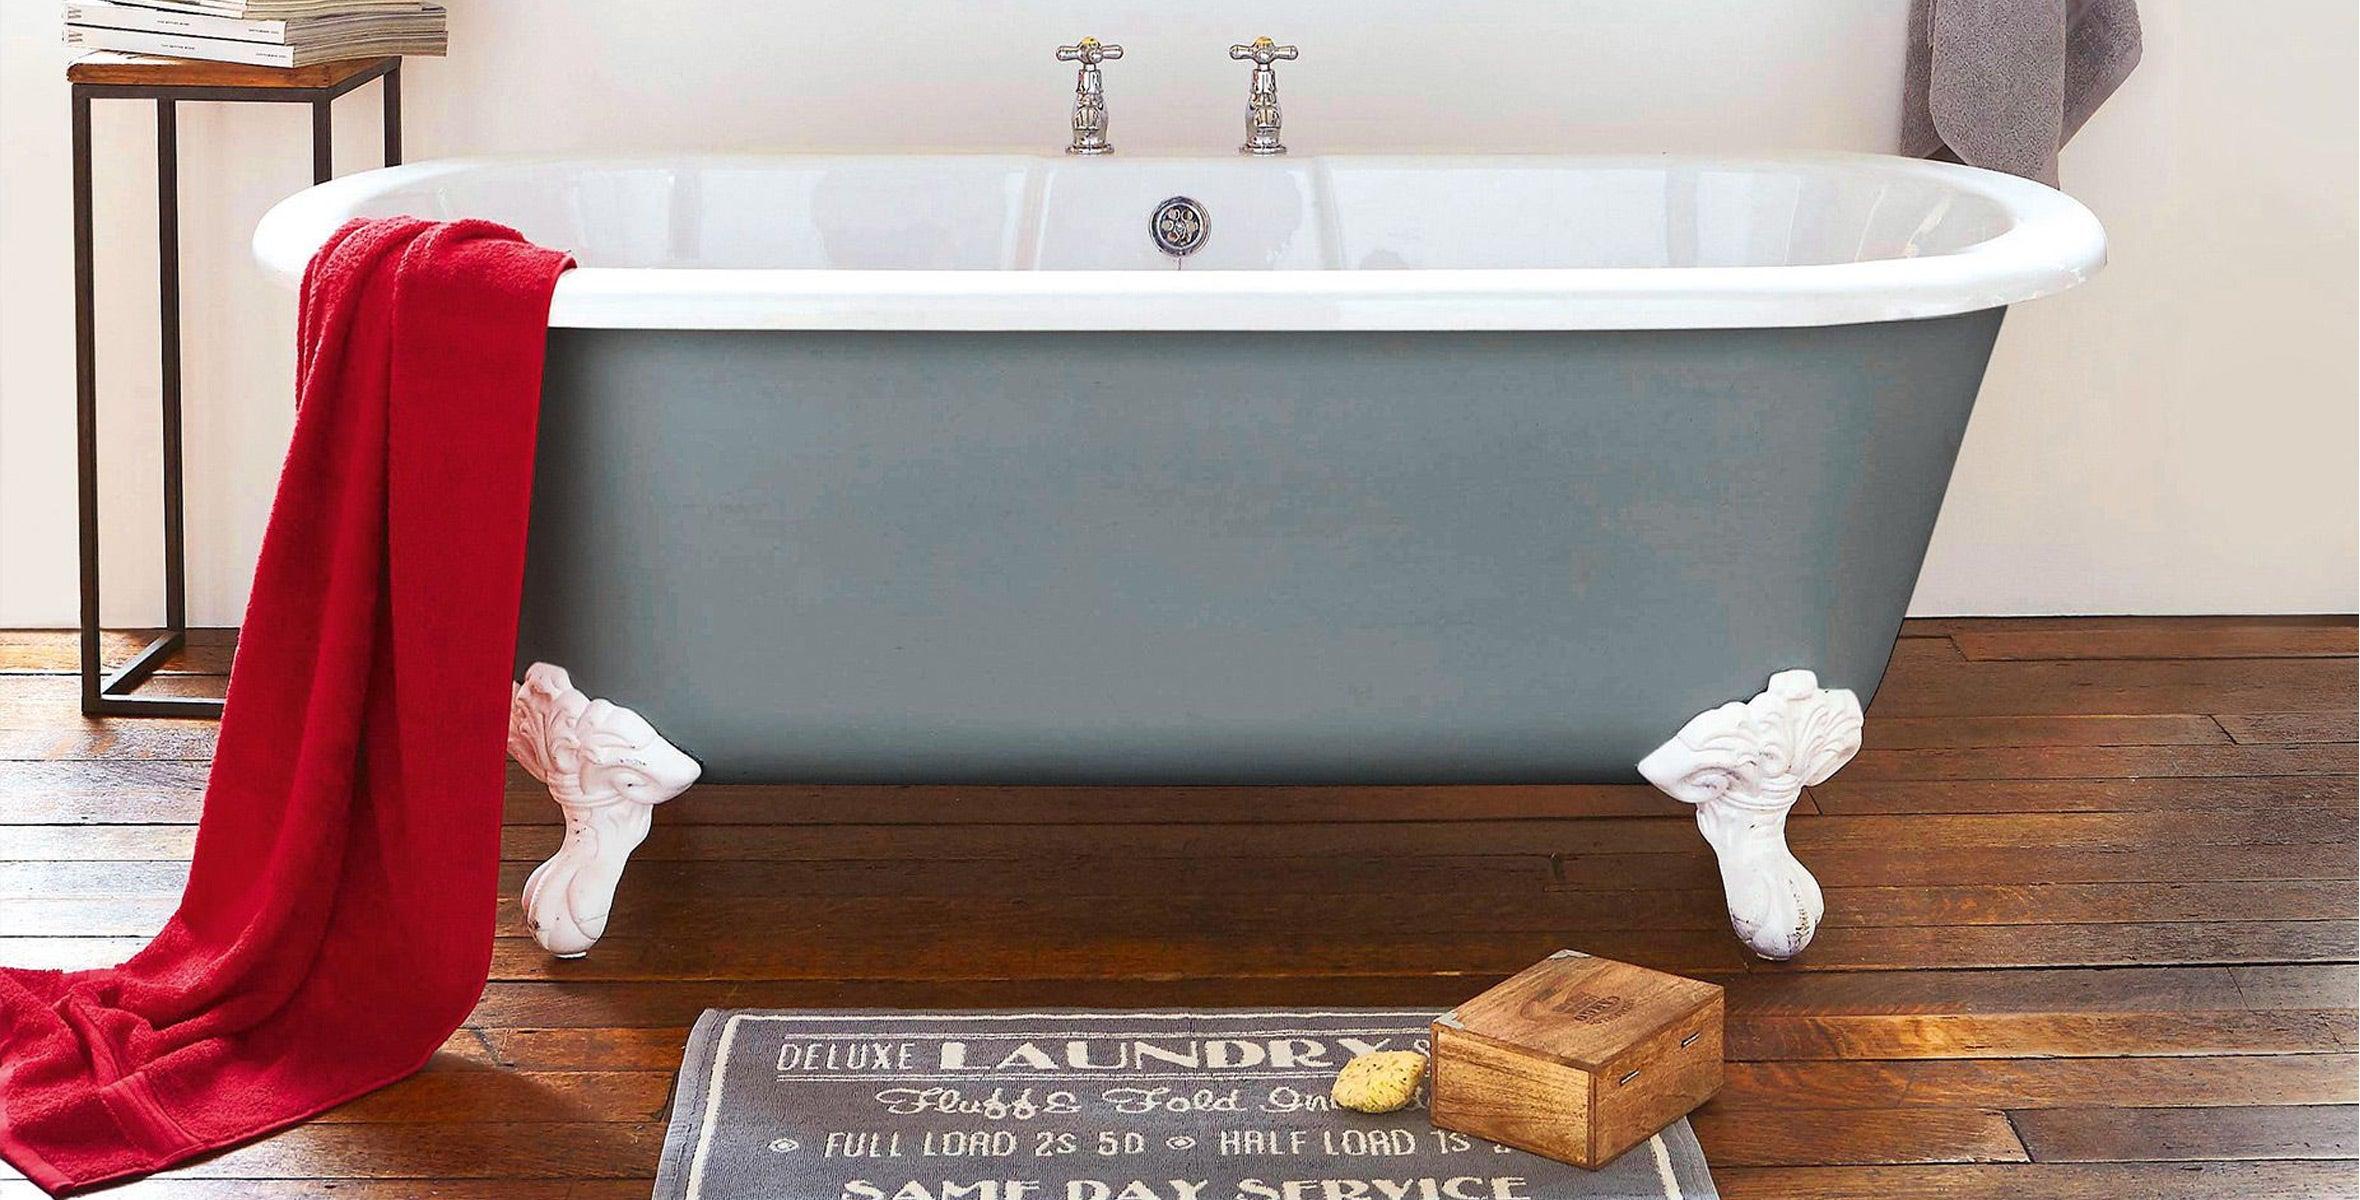 Bathroom Trends - Salvage Retro